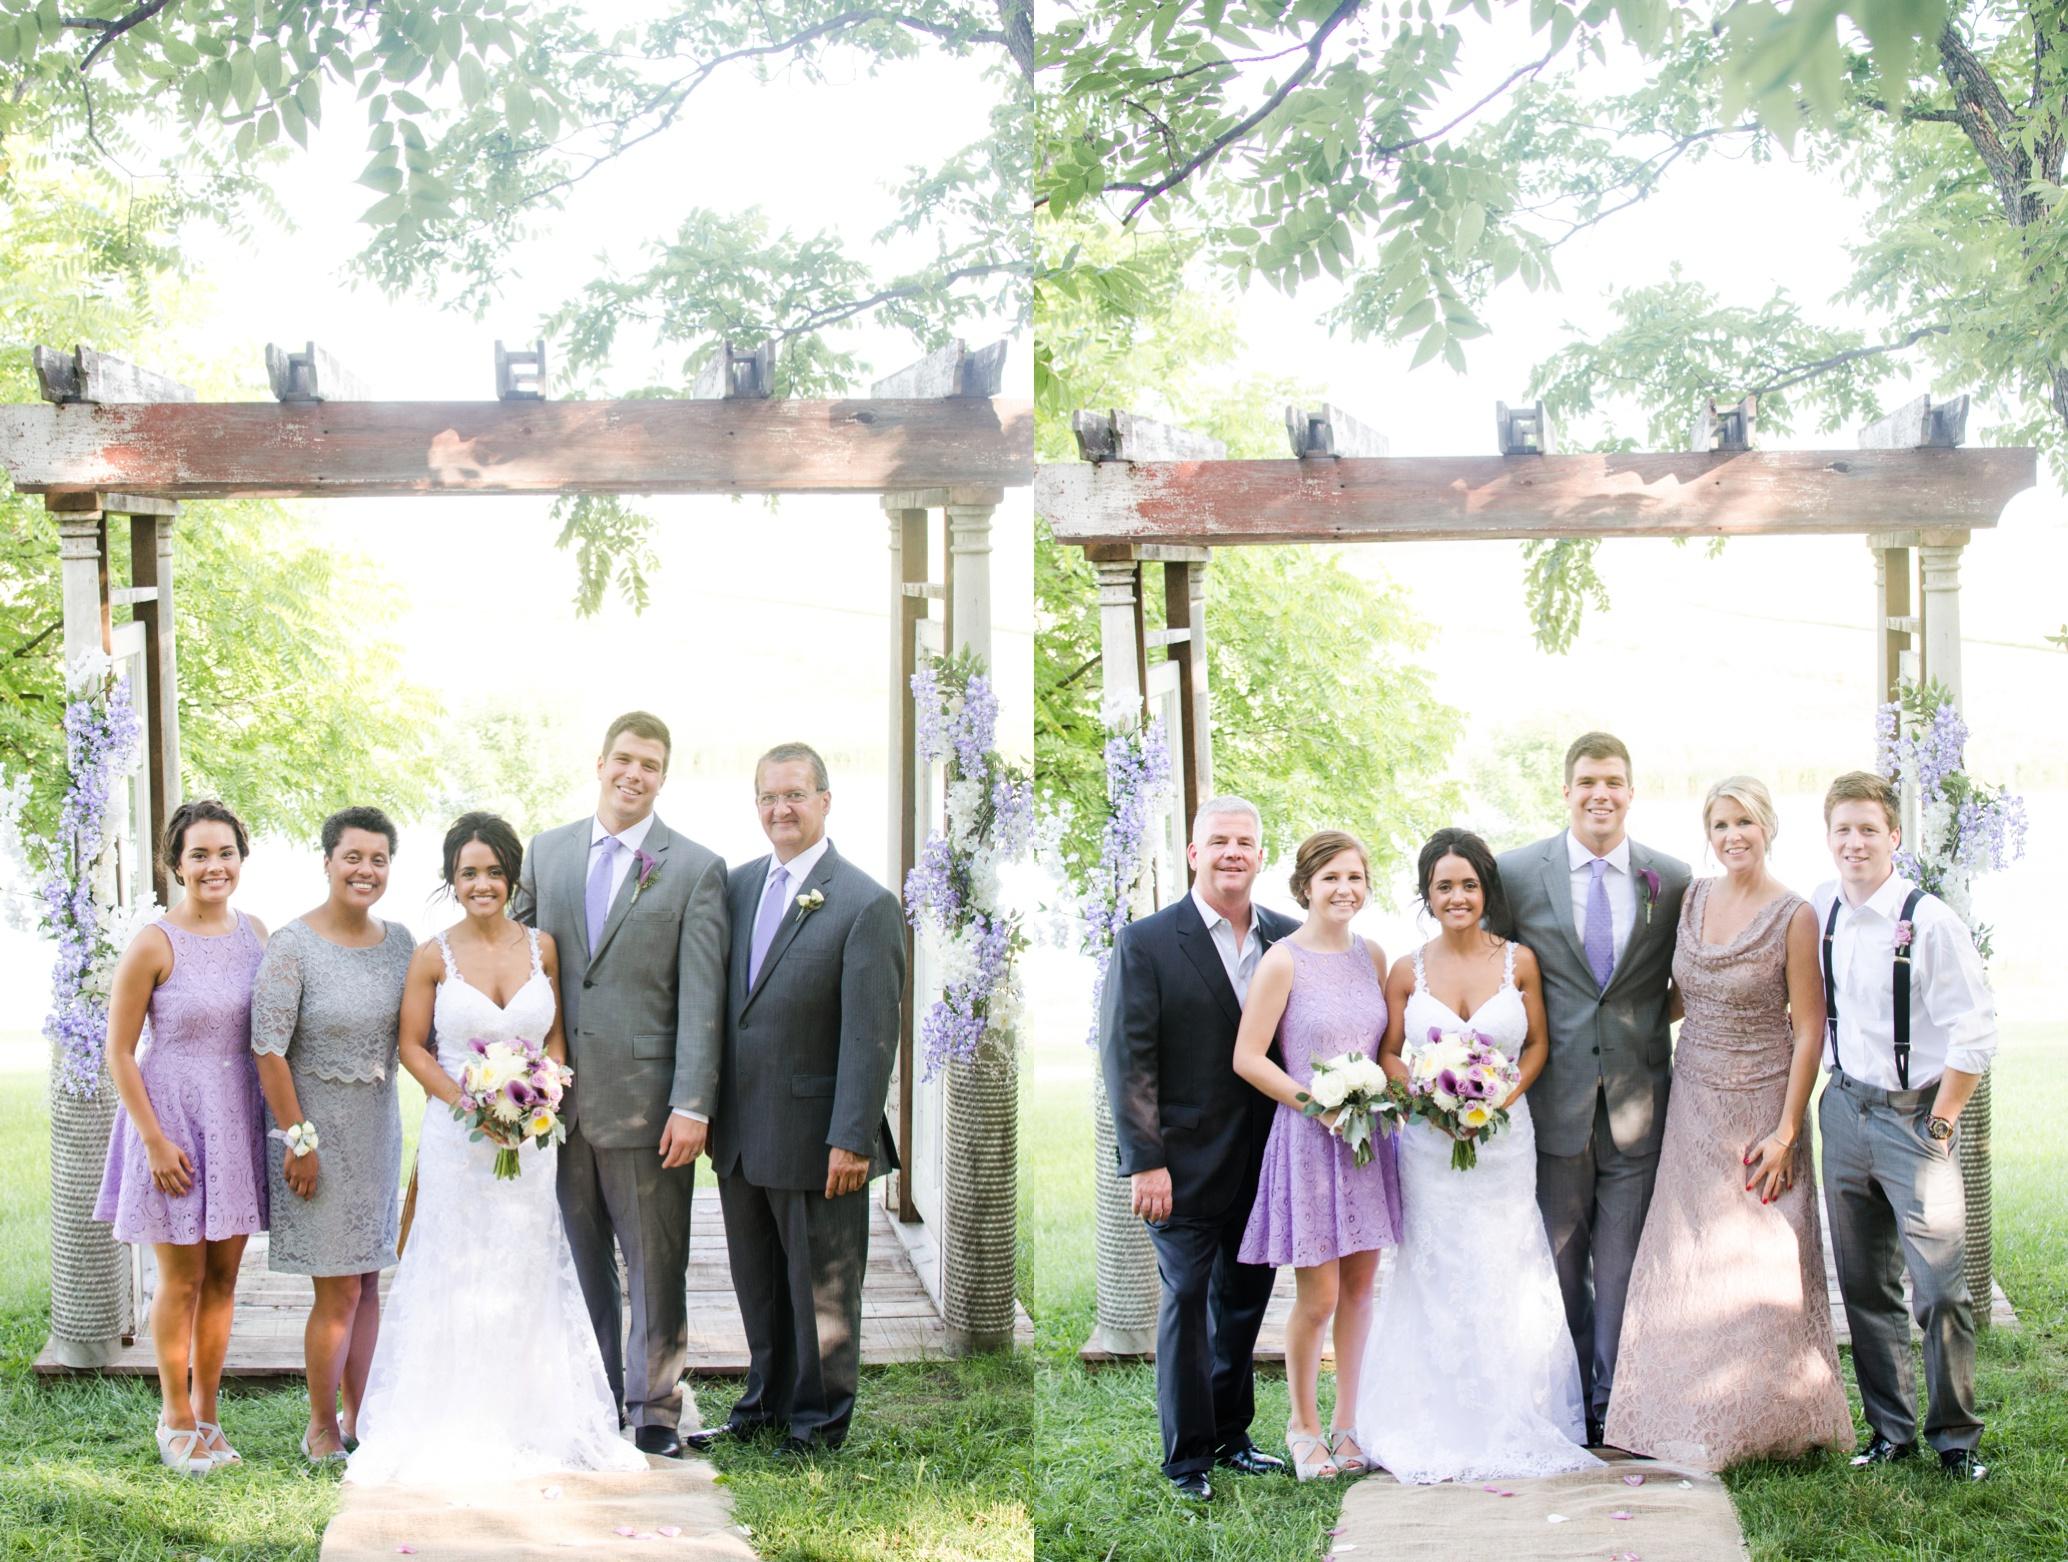 Barnes' Place Rustic Outdoor Wedding | Ali Leigh Photo Minneapolis Wedding Photographer_0138.jpg